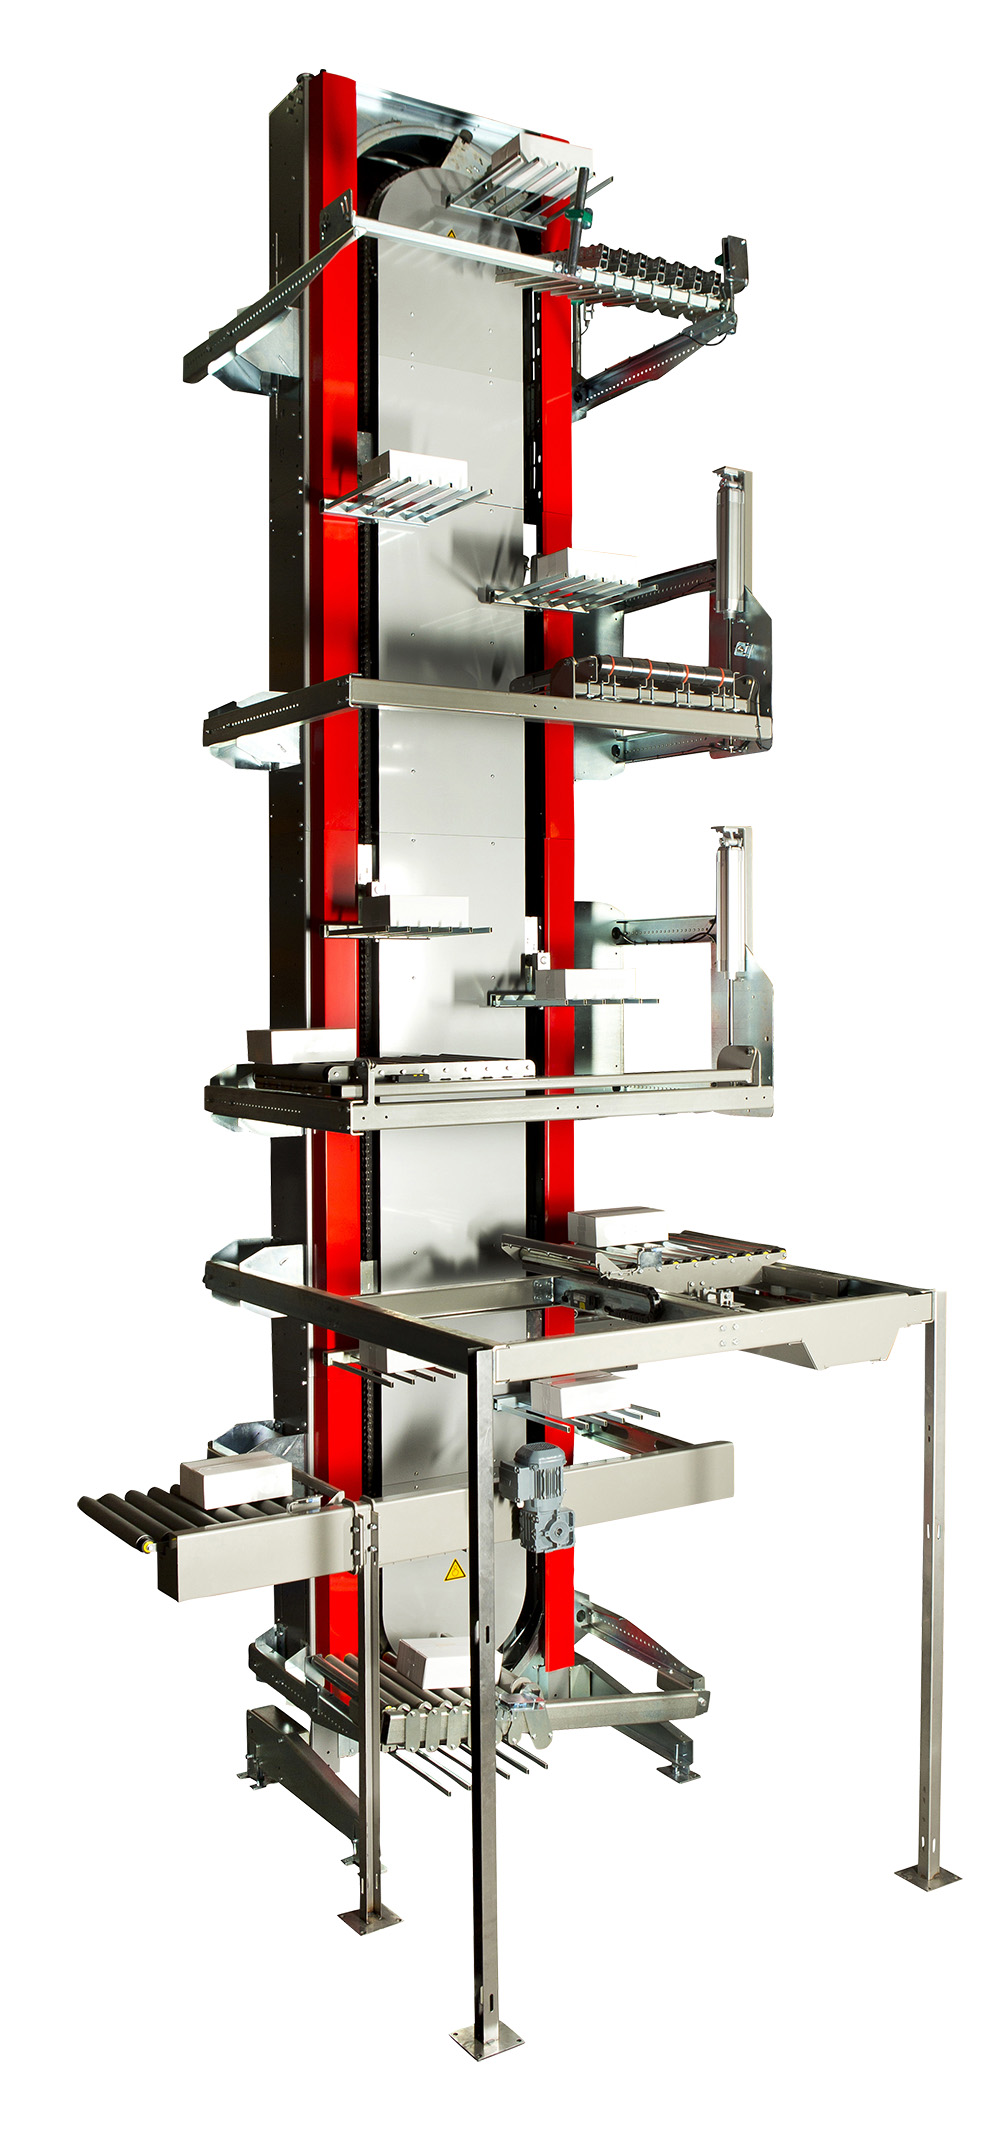 Prorunner 174 Mk5 Vertical Conveyor Rotary Lifter Dyno